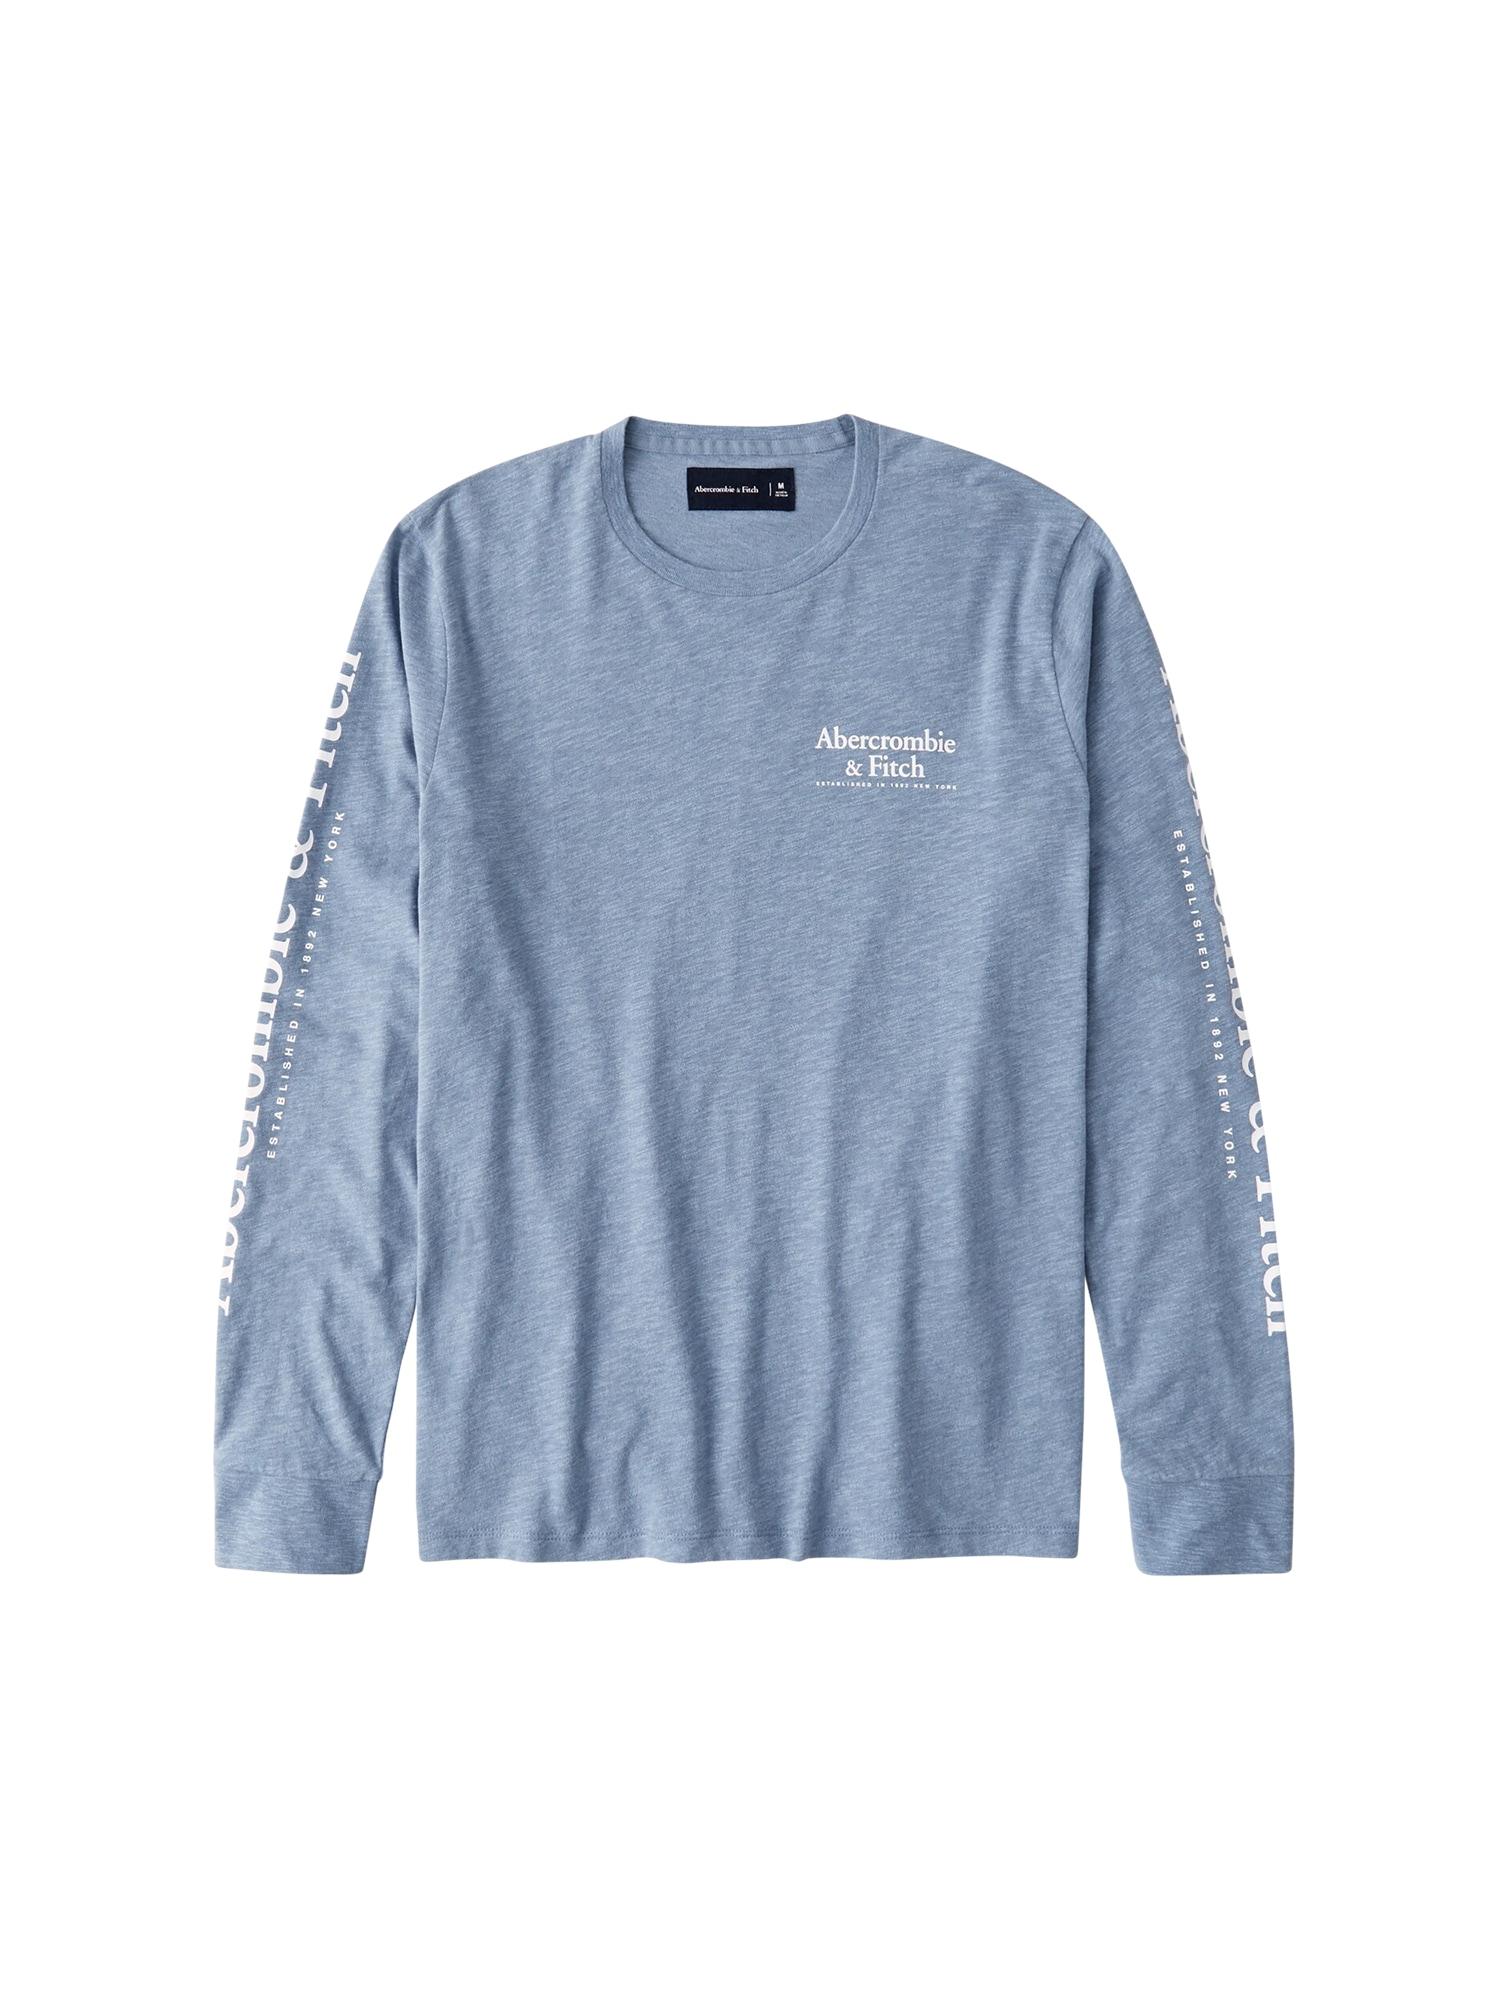 Abercrombie & Fitch Marškinėliai 'LS CORE EXPLODED PRINT' mėlyna